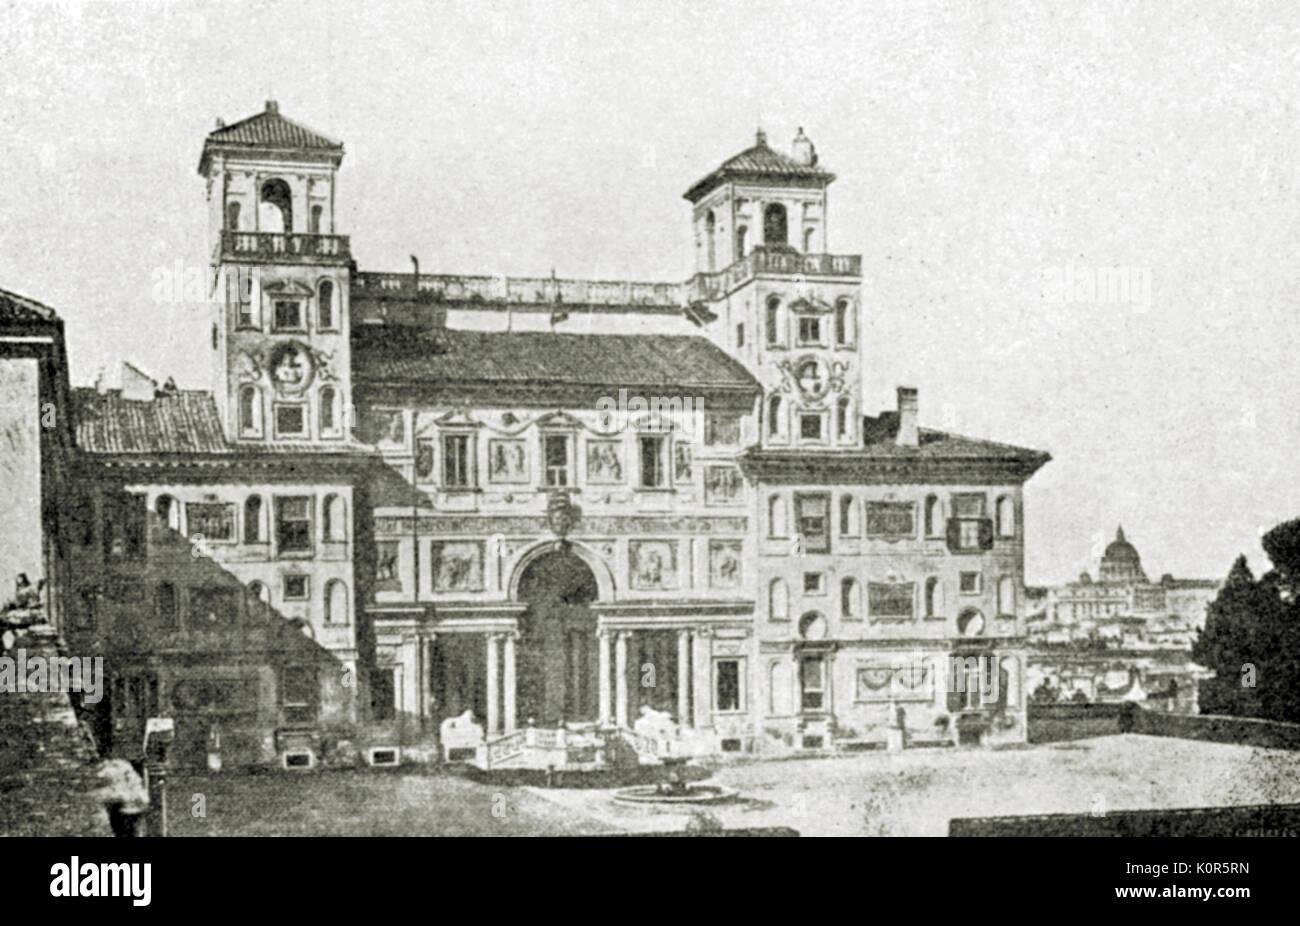 Villa Medici on Monte Pincio in Rome - where Hector Berlioz won music prize. French composer, 11 December 1803 - 8 March 1869 - Stock Image